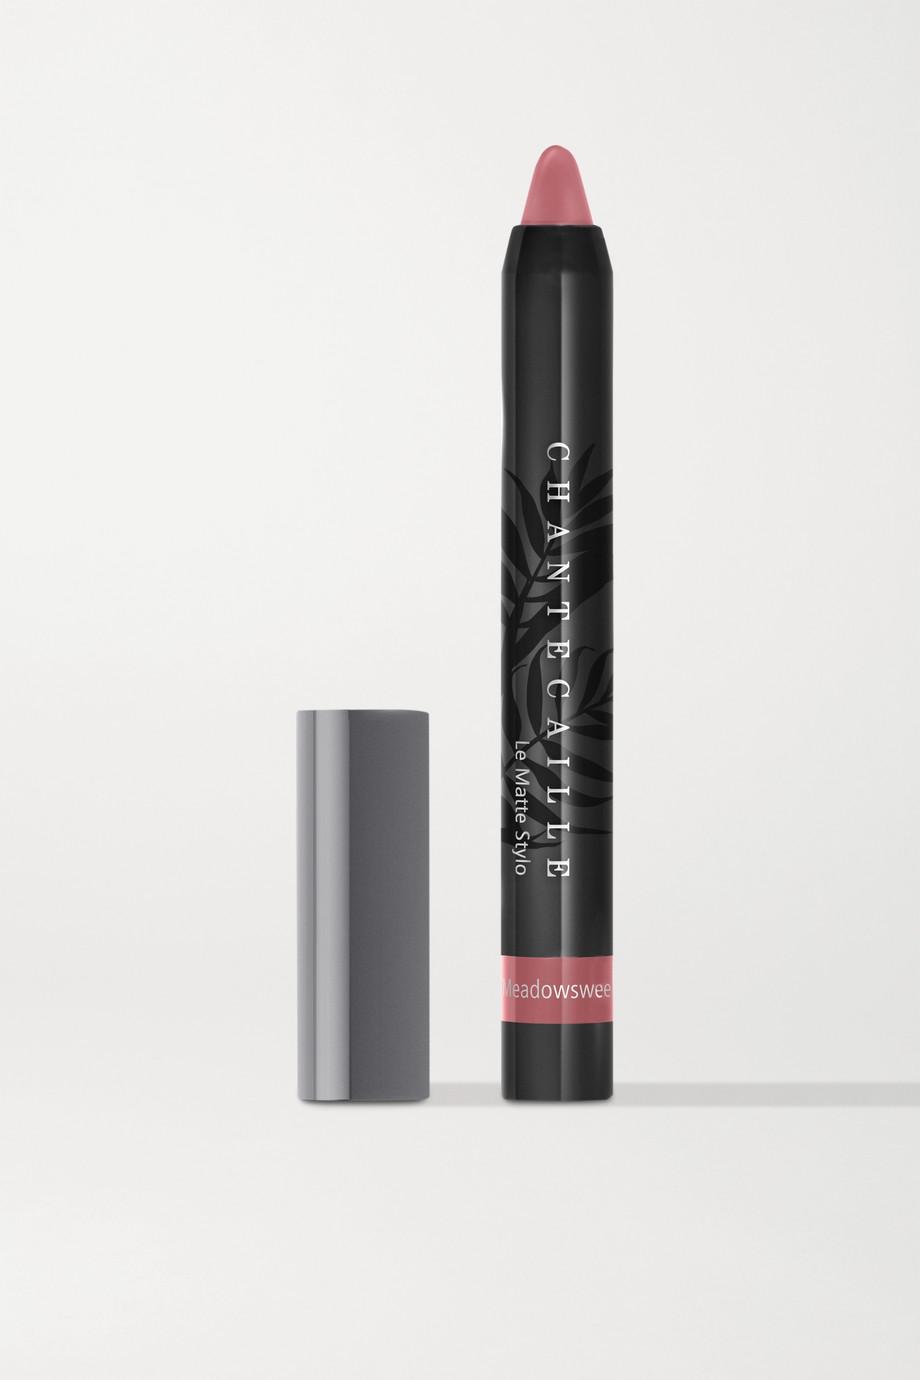 Chantecaille Le Matte Stylo Lip Crayon - Meadowsweet